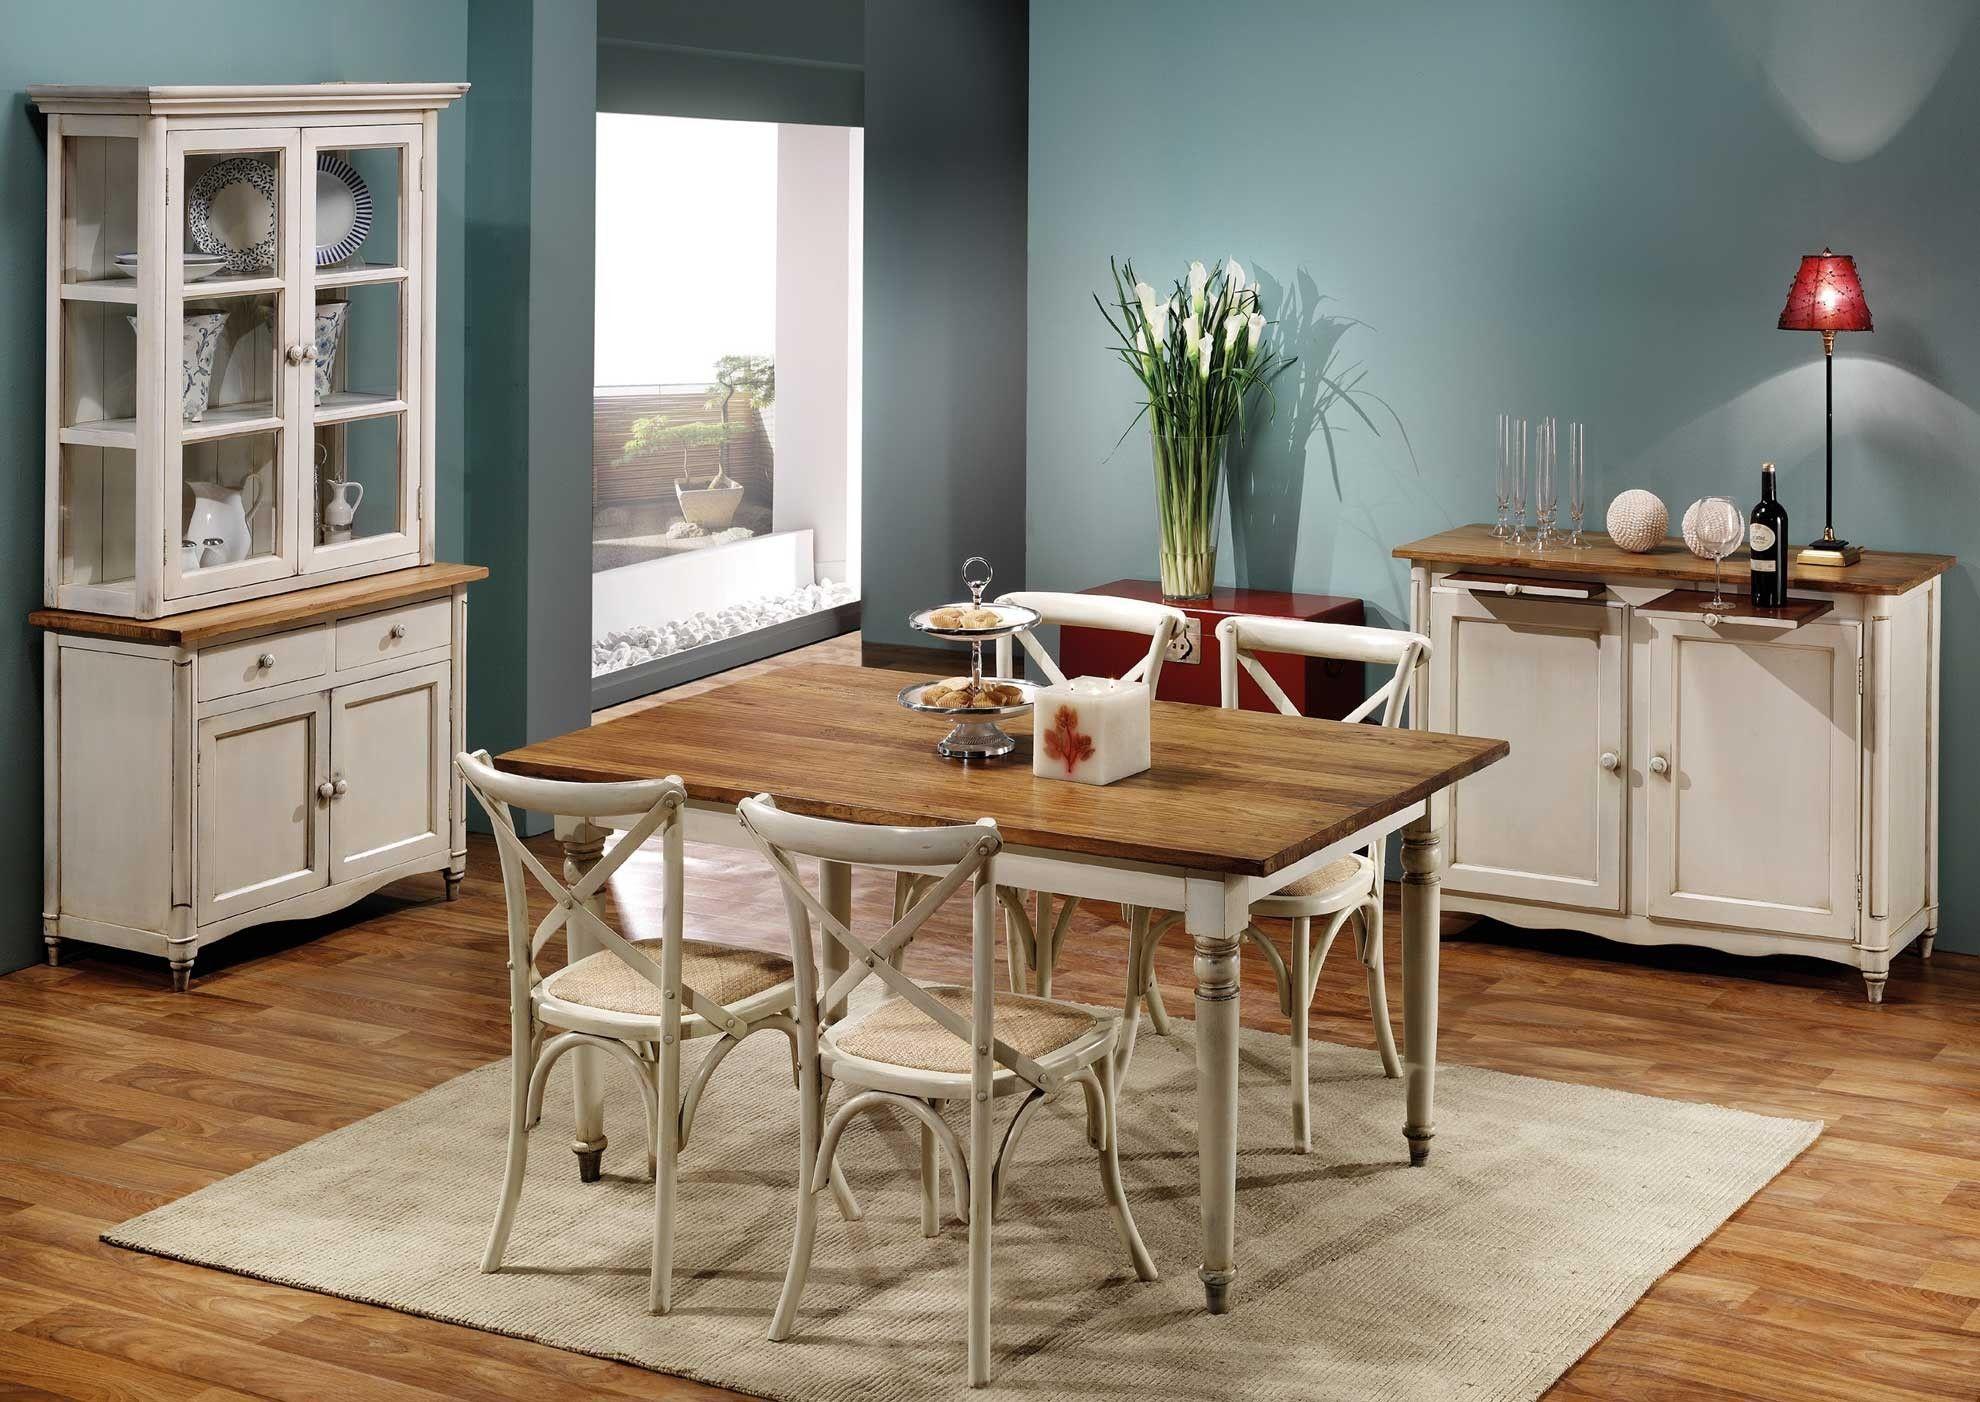 comedor-vintage-blanco-fergus-ambar-muebles_1_2.jpg 1.980×1.402 ...